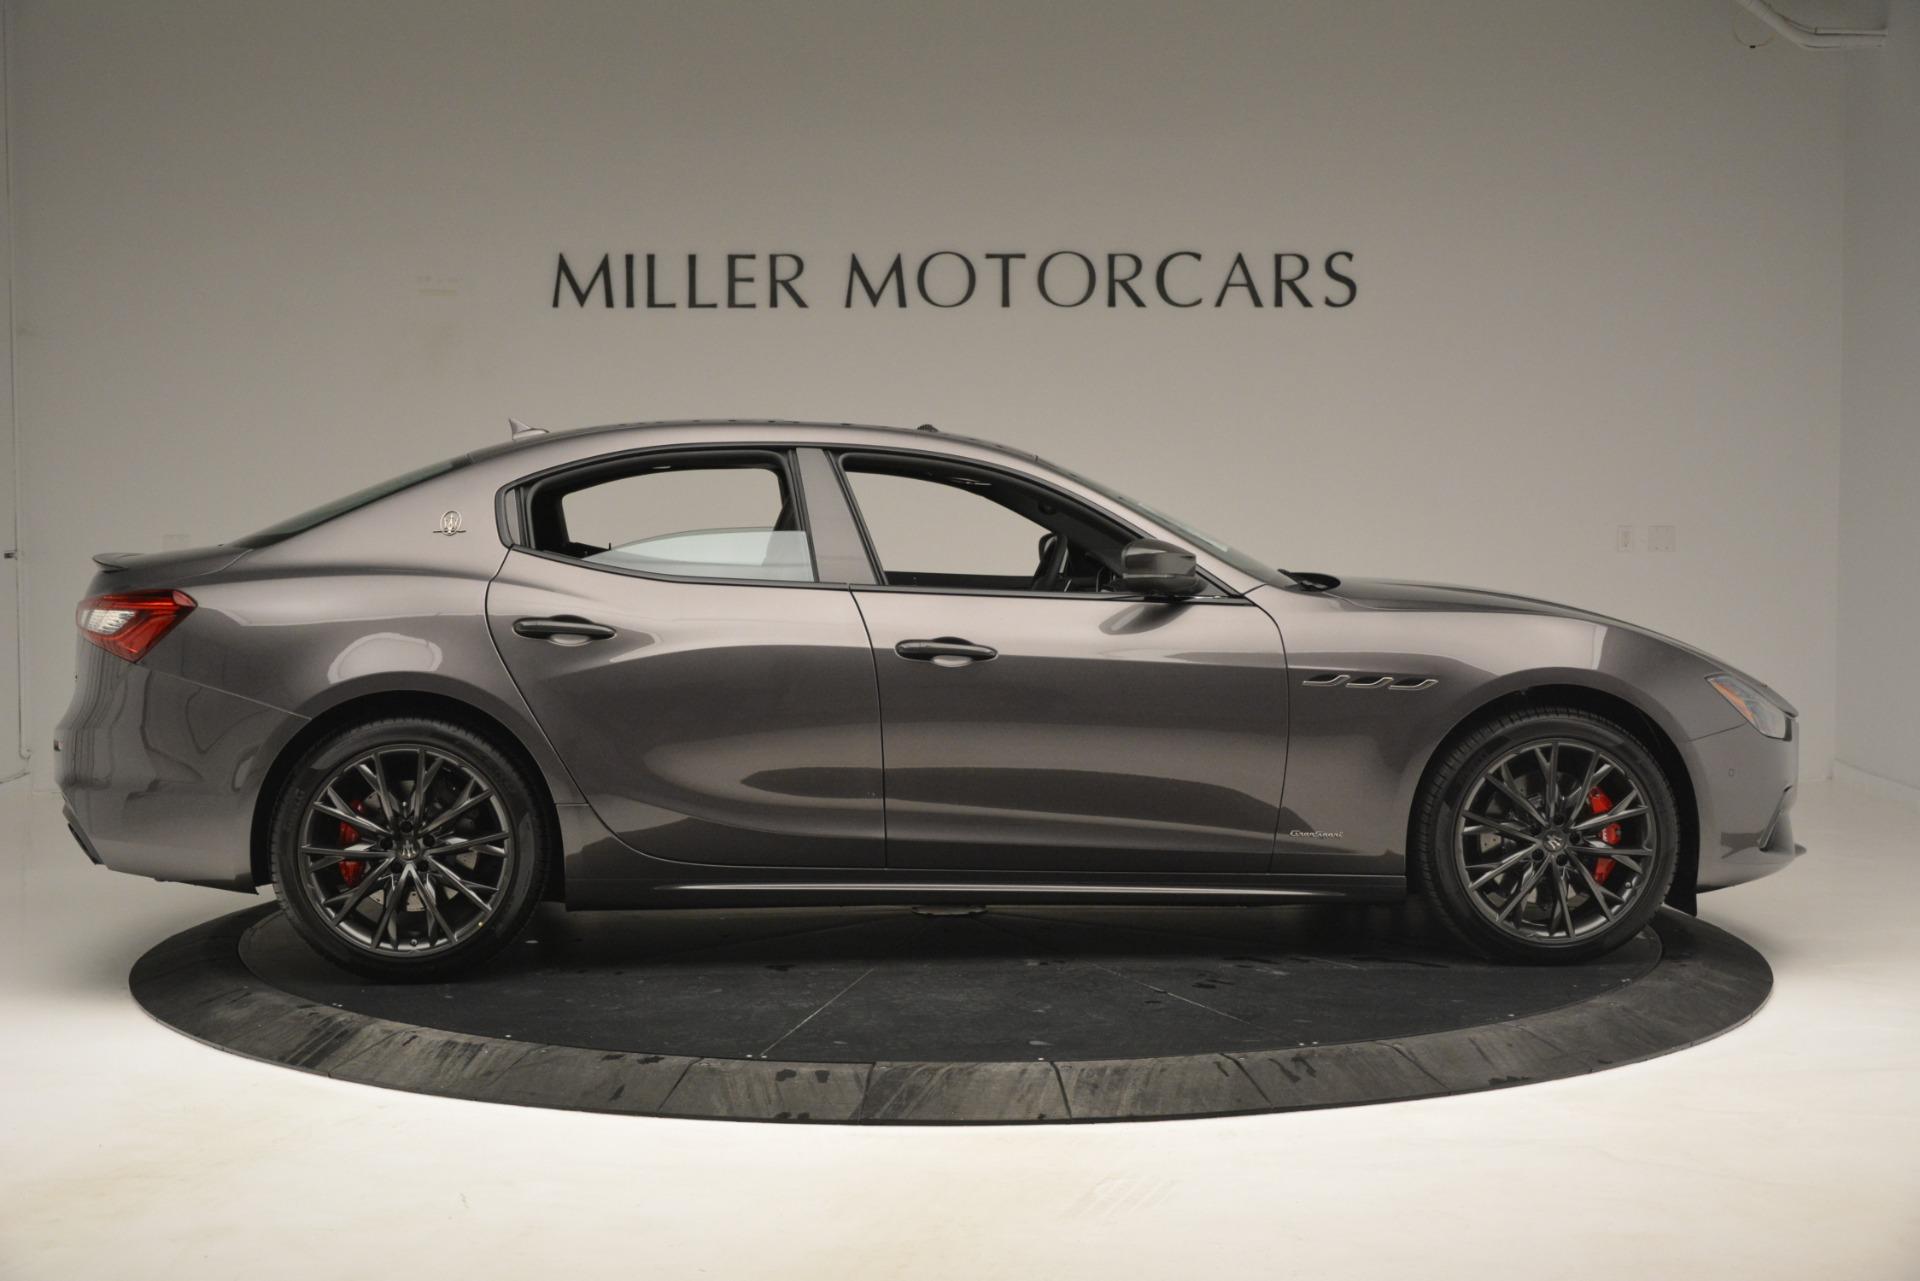 New 2019 Maserati Ghibli S Q4 GranSport For Sale In Westport, CT 2925_p10